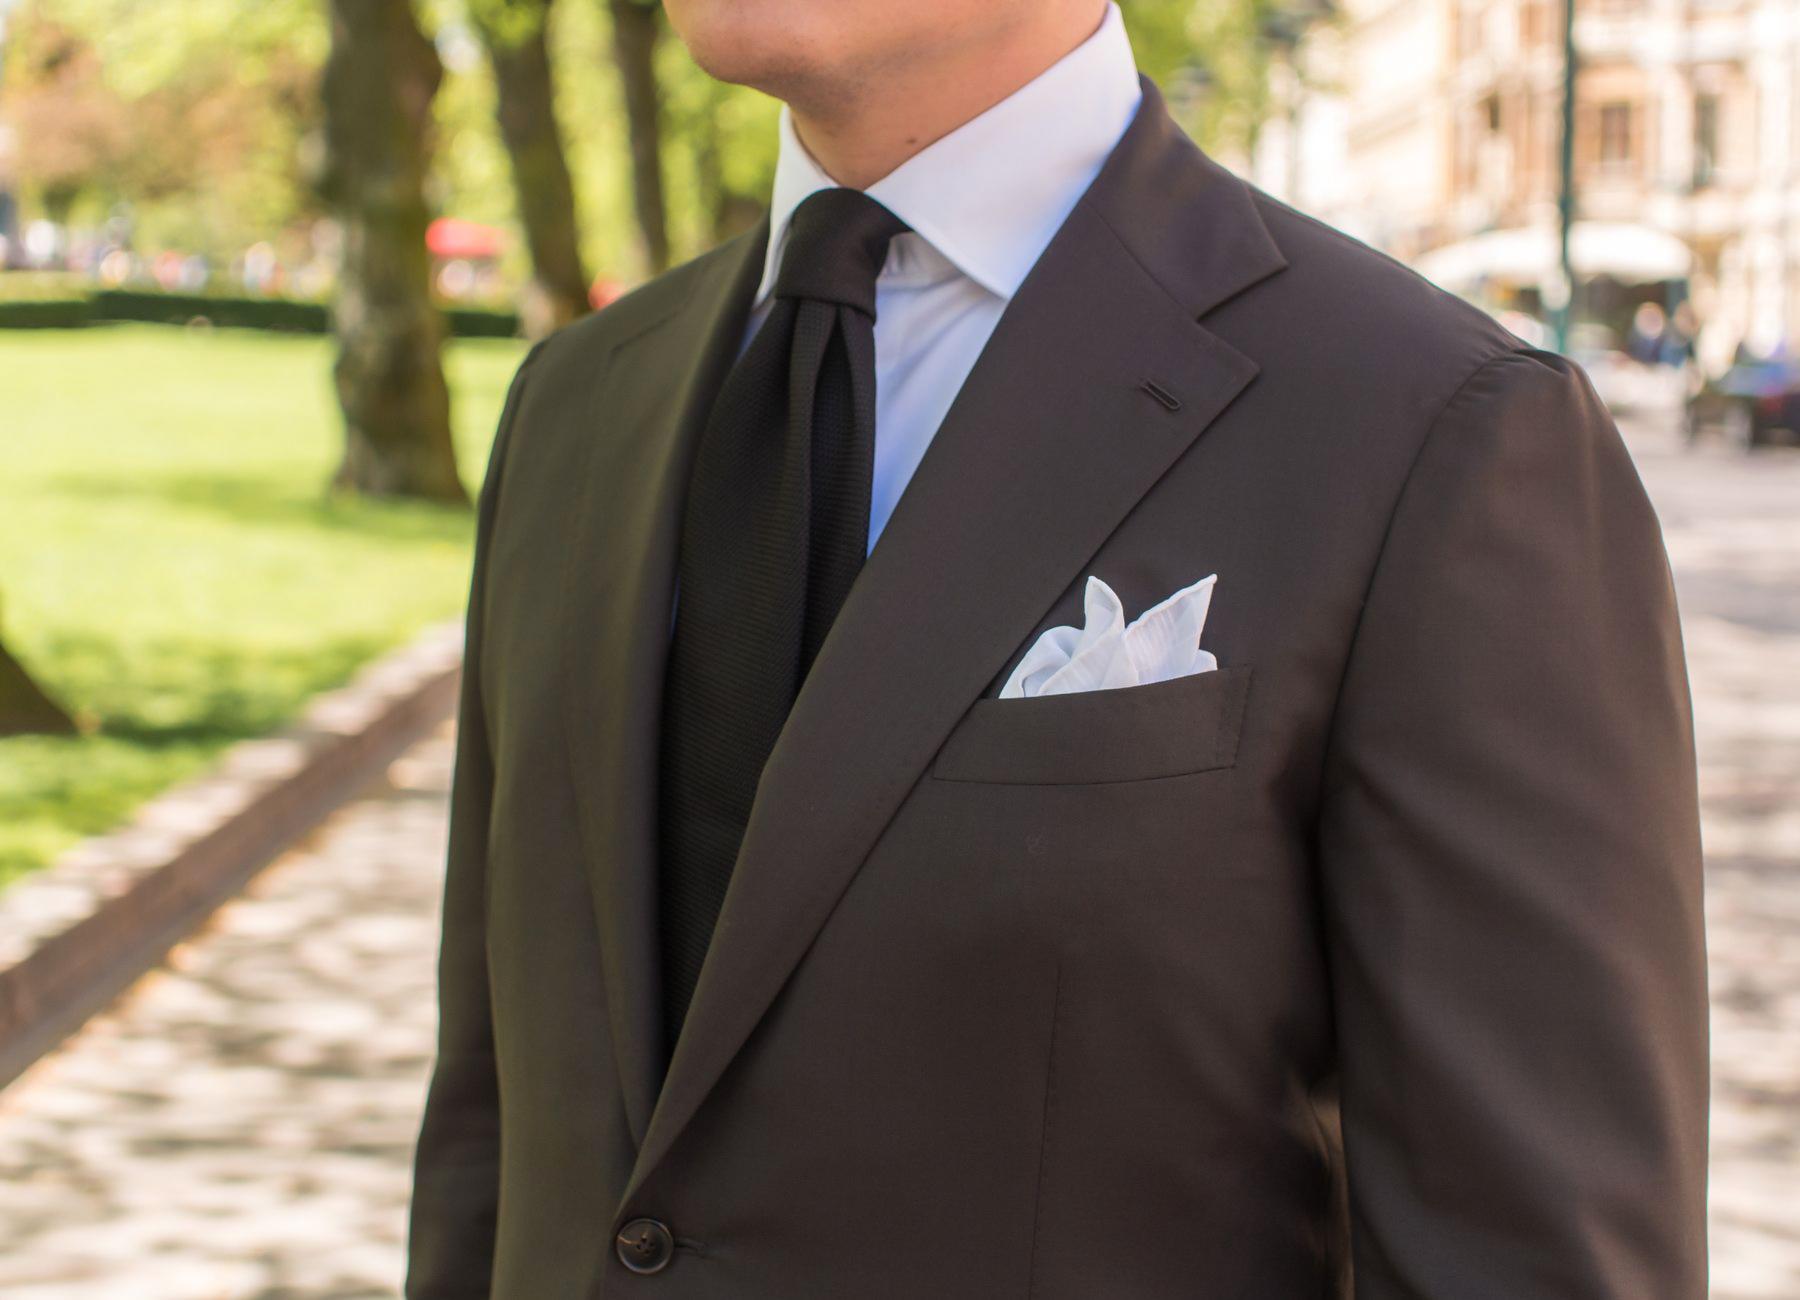 brown suit, white dress shirt and black tie color combination